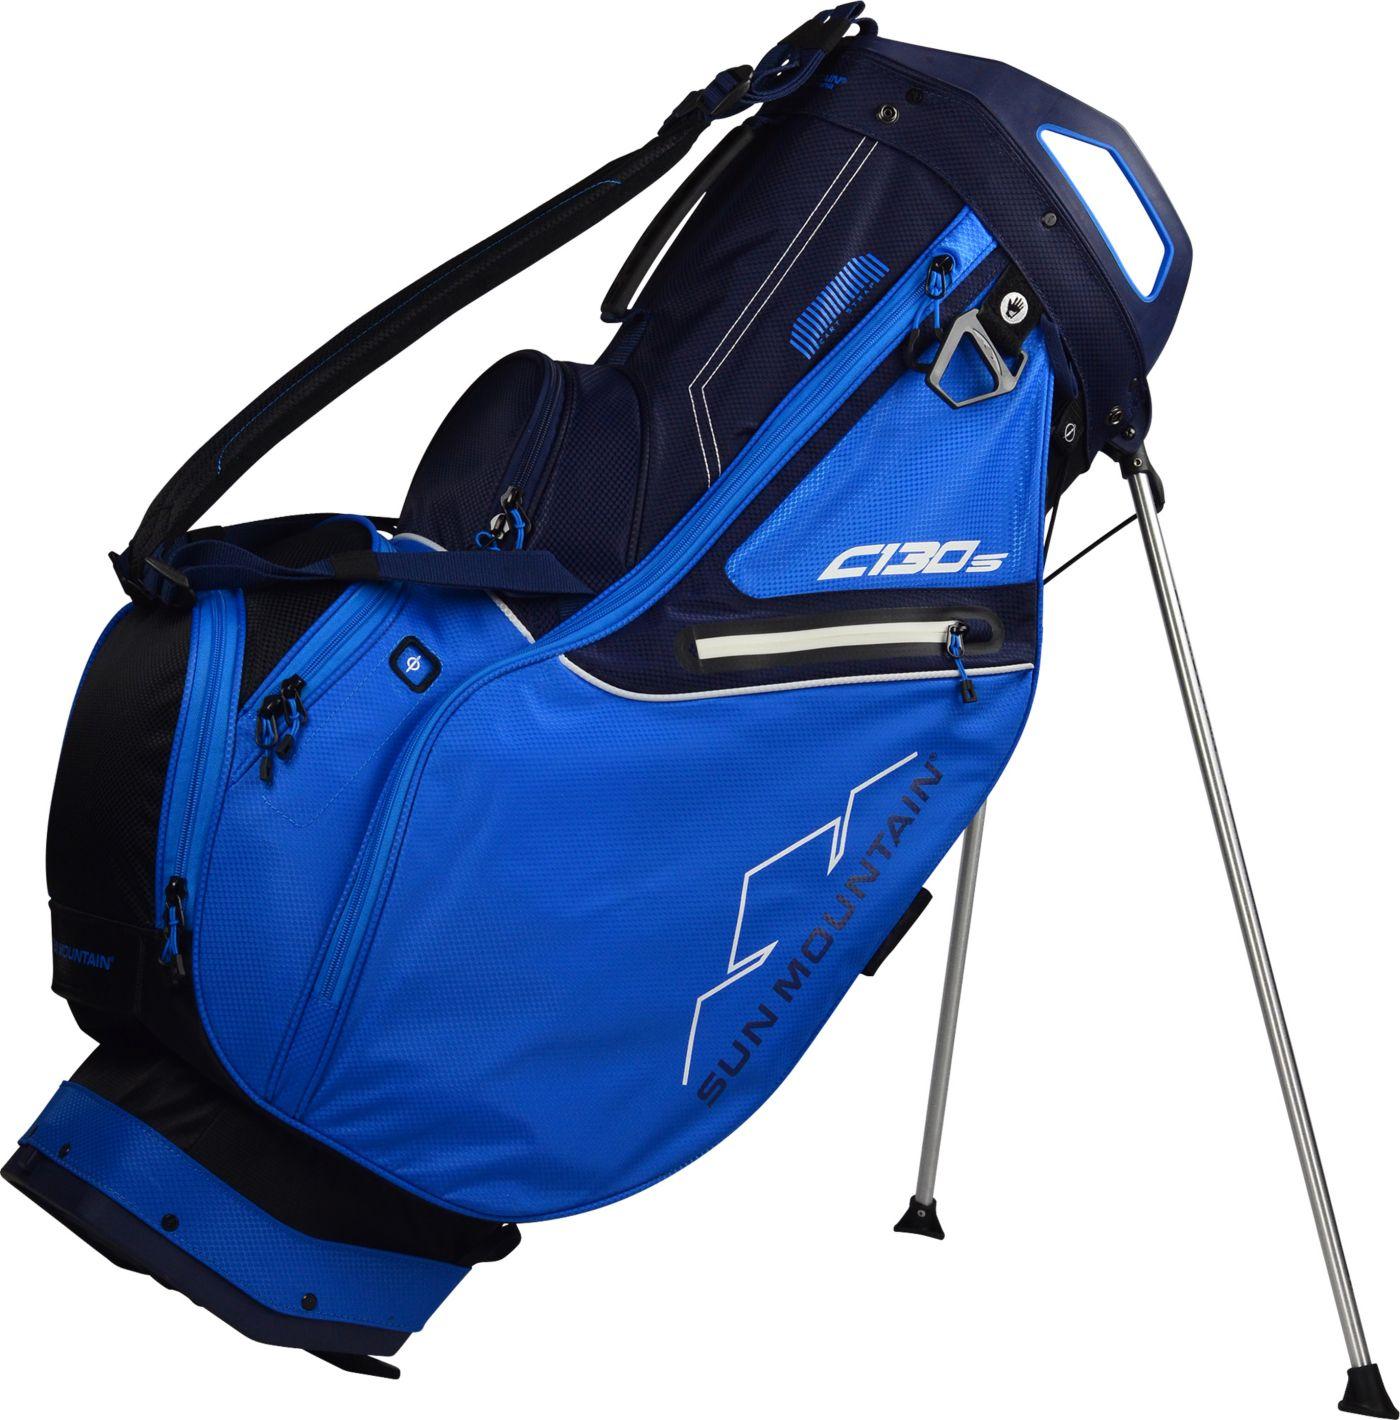 Sun Mountain 2020 C-130S Stand Golf Bag